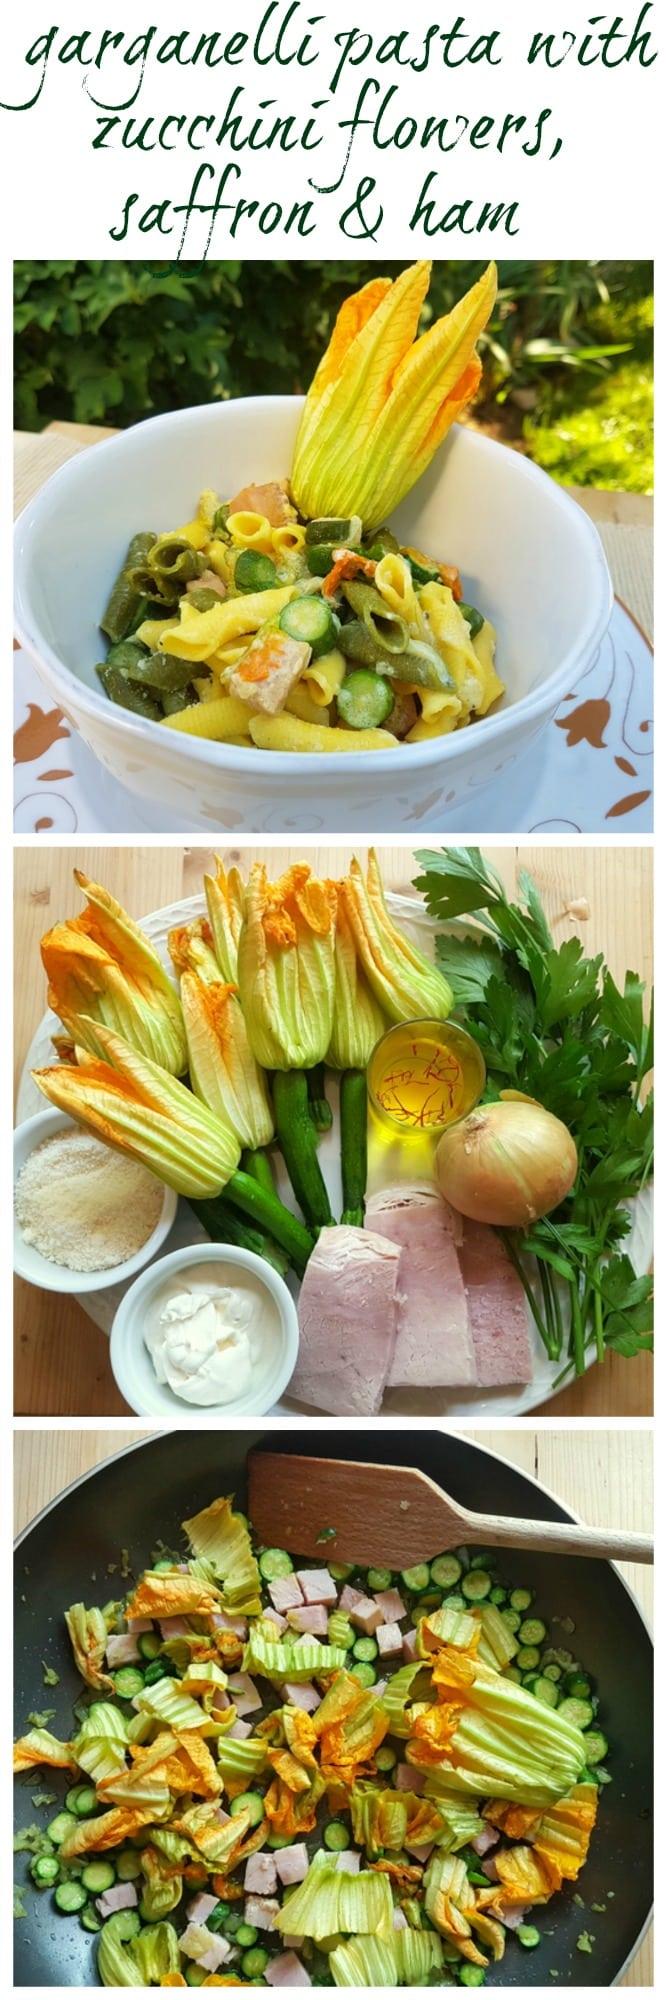 pasta with zucchini flowers, saffron and ham